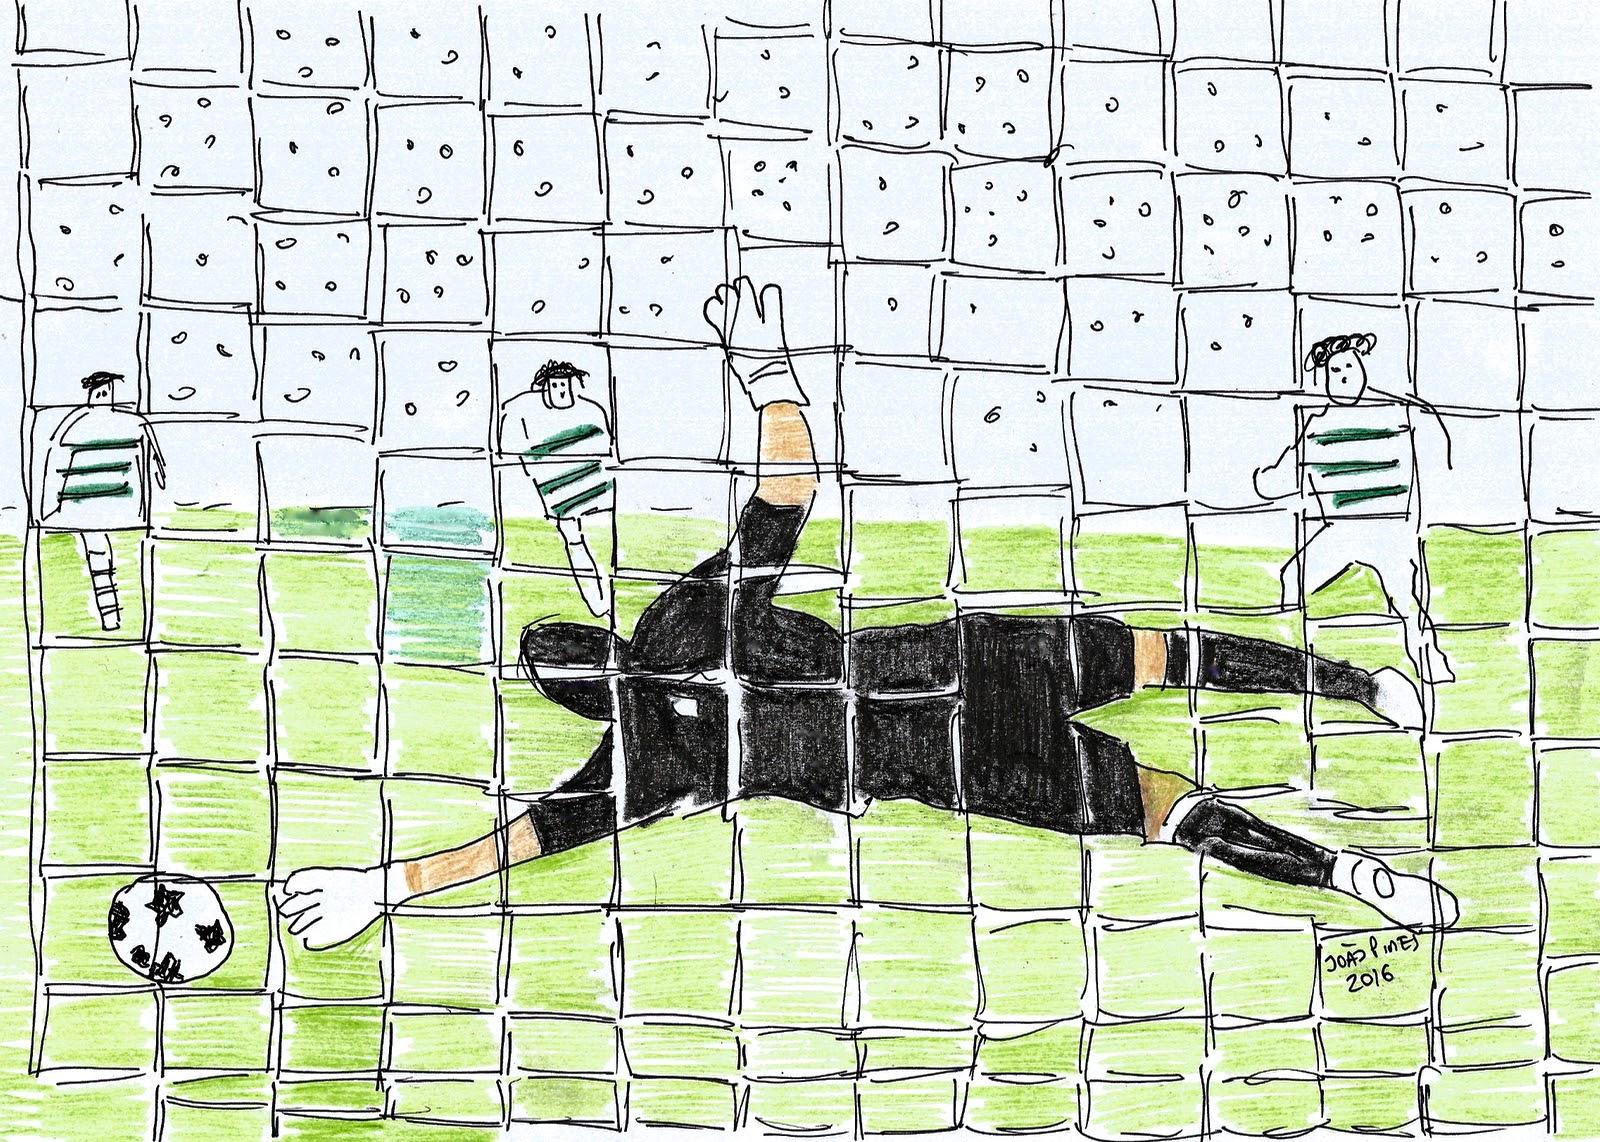 2016_euro-2016-futebol_tinta-permanente_desenho-aguarela_Joao-Pires (1).jpg